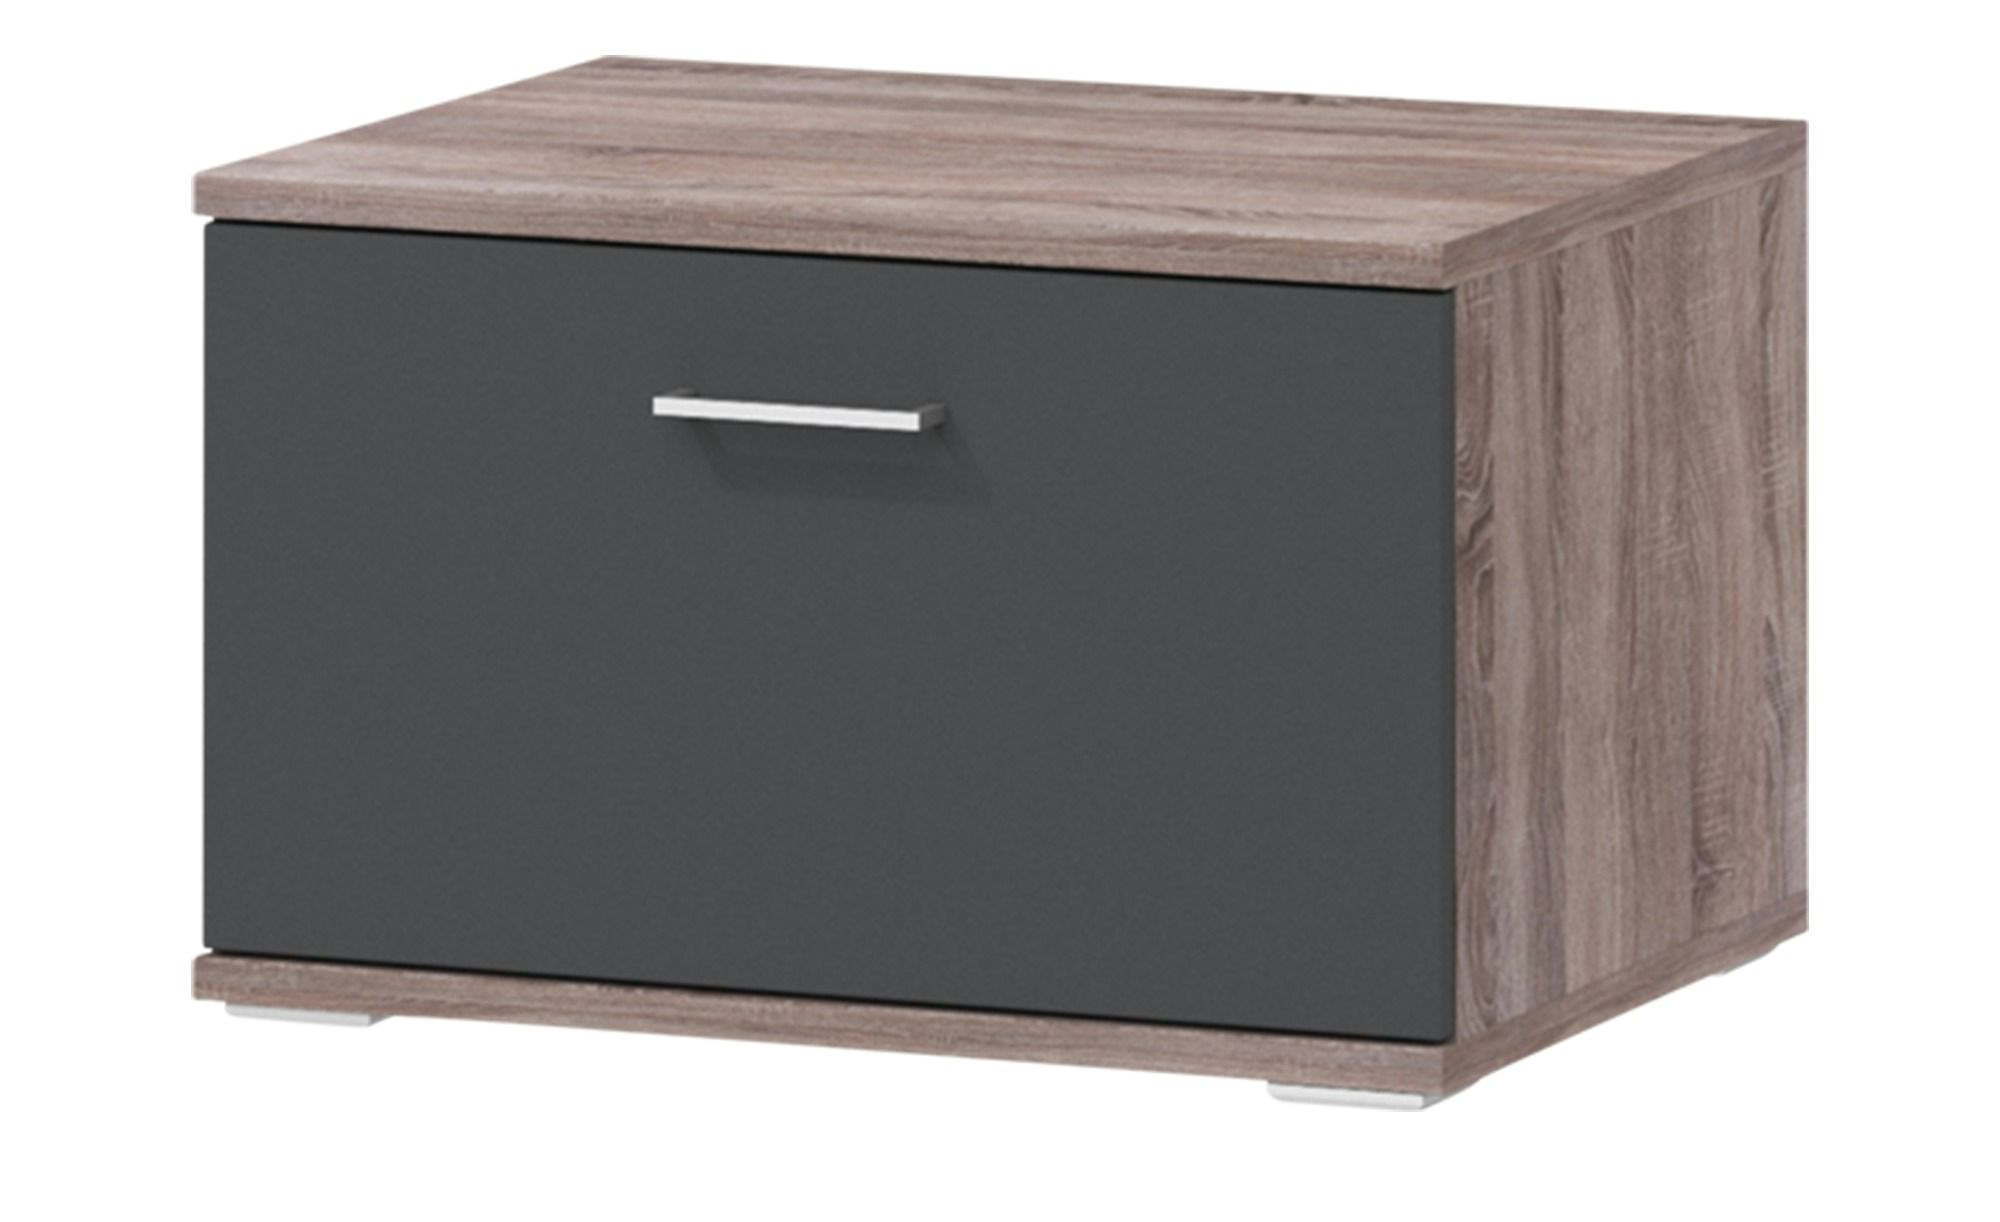 Uno Lowboard Onyx Sideboard Holz Lowboard Und Kommode Sideboard